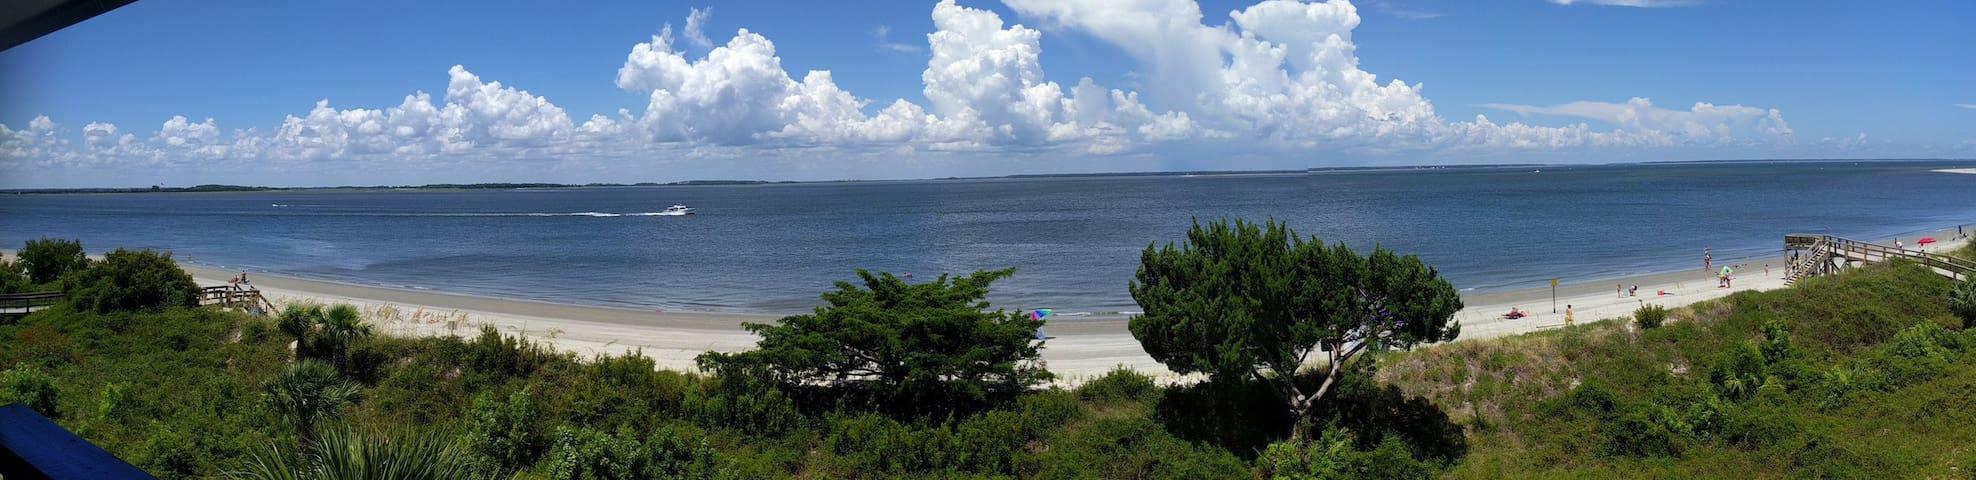 Sand Dollar - Beachfront Condo 1BR/1BA - Tybee Island - Appartement en résidence